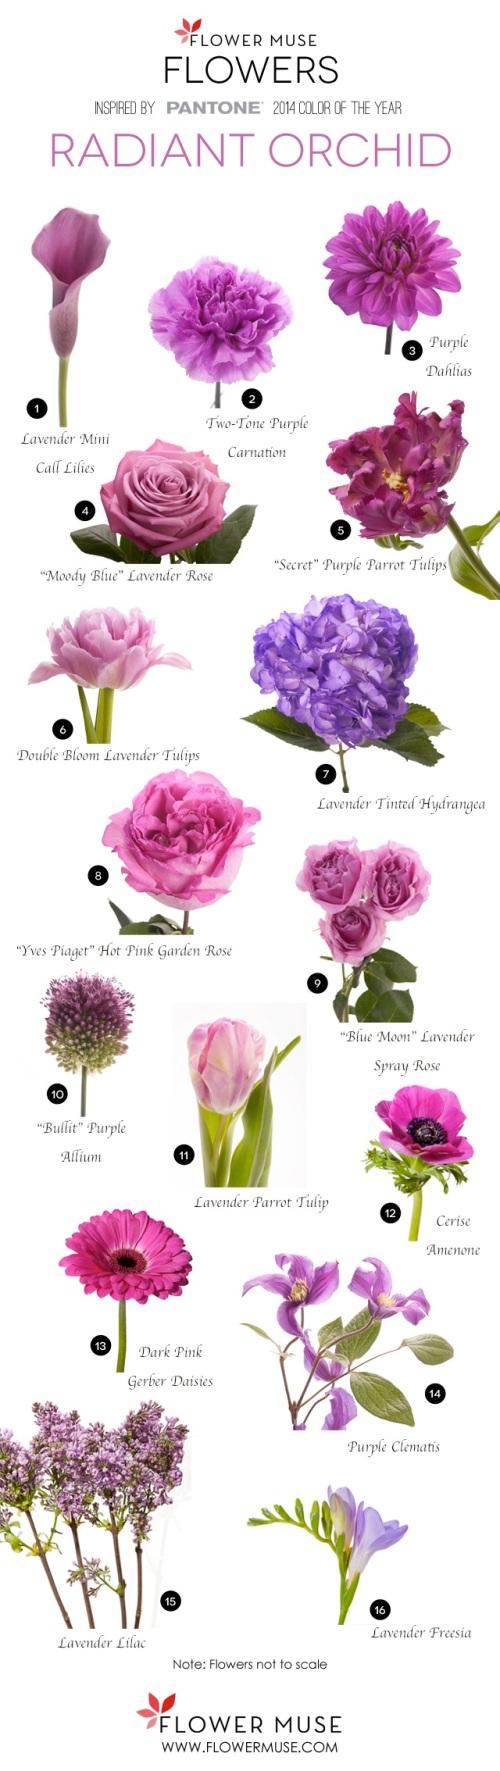 Credit: flowermuse.com